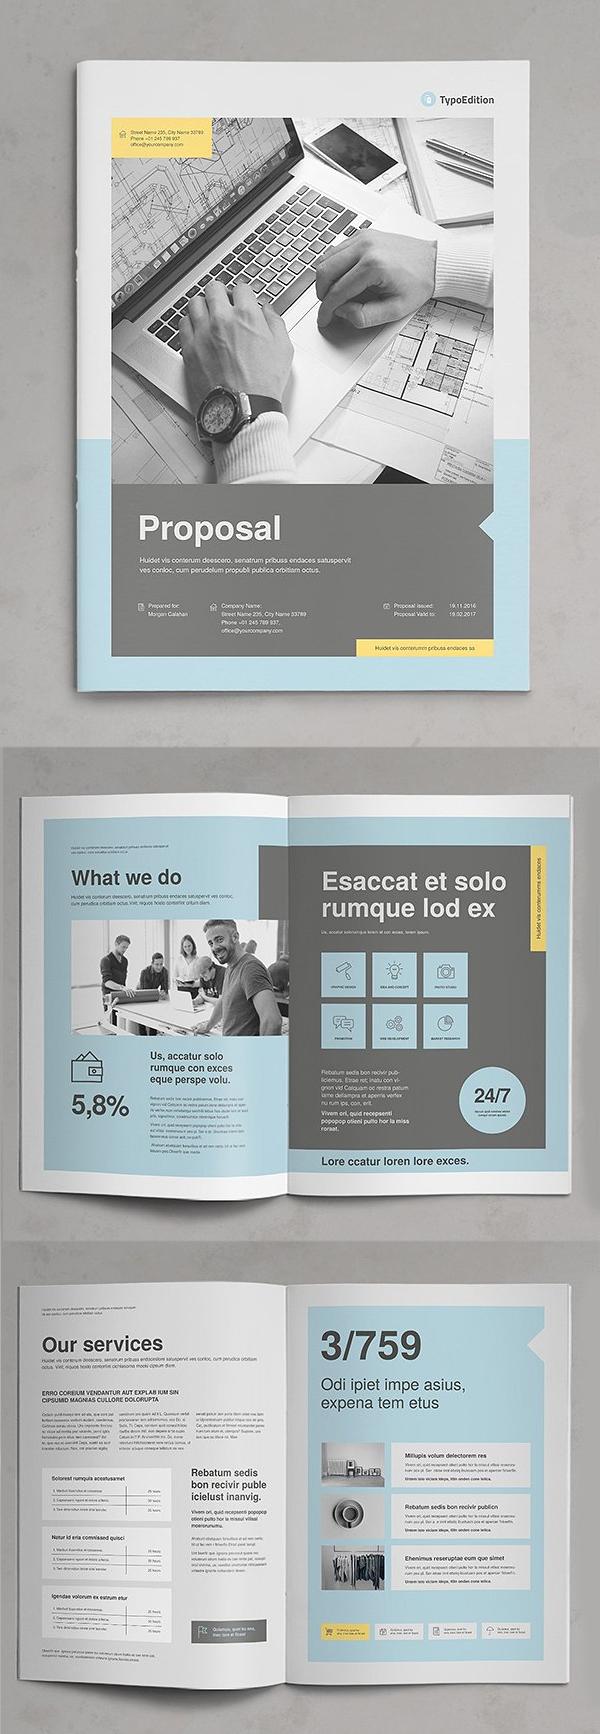 Professional Business Proposal Templates Design - 19